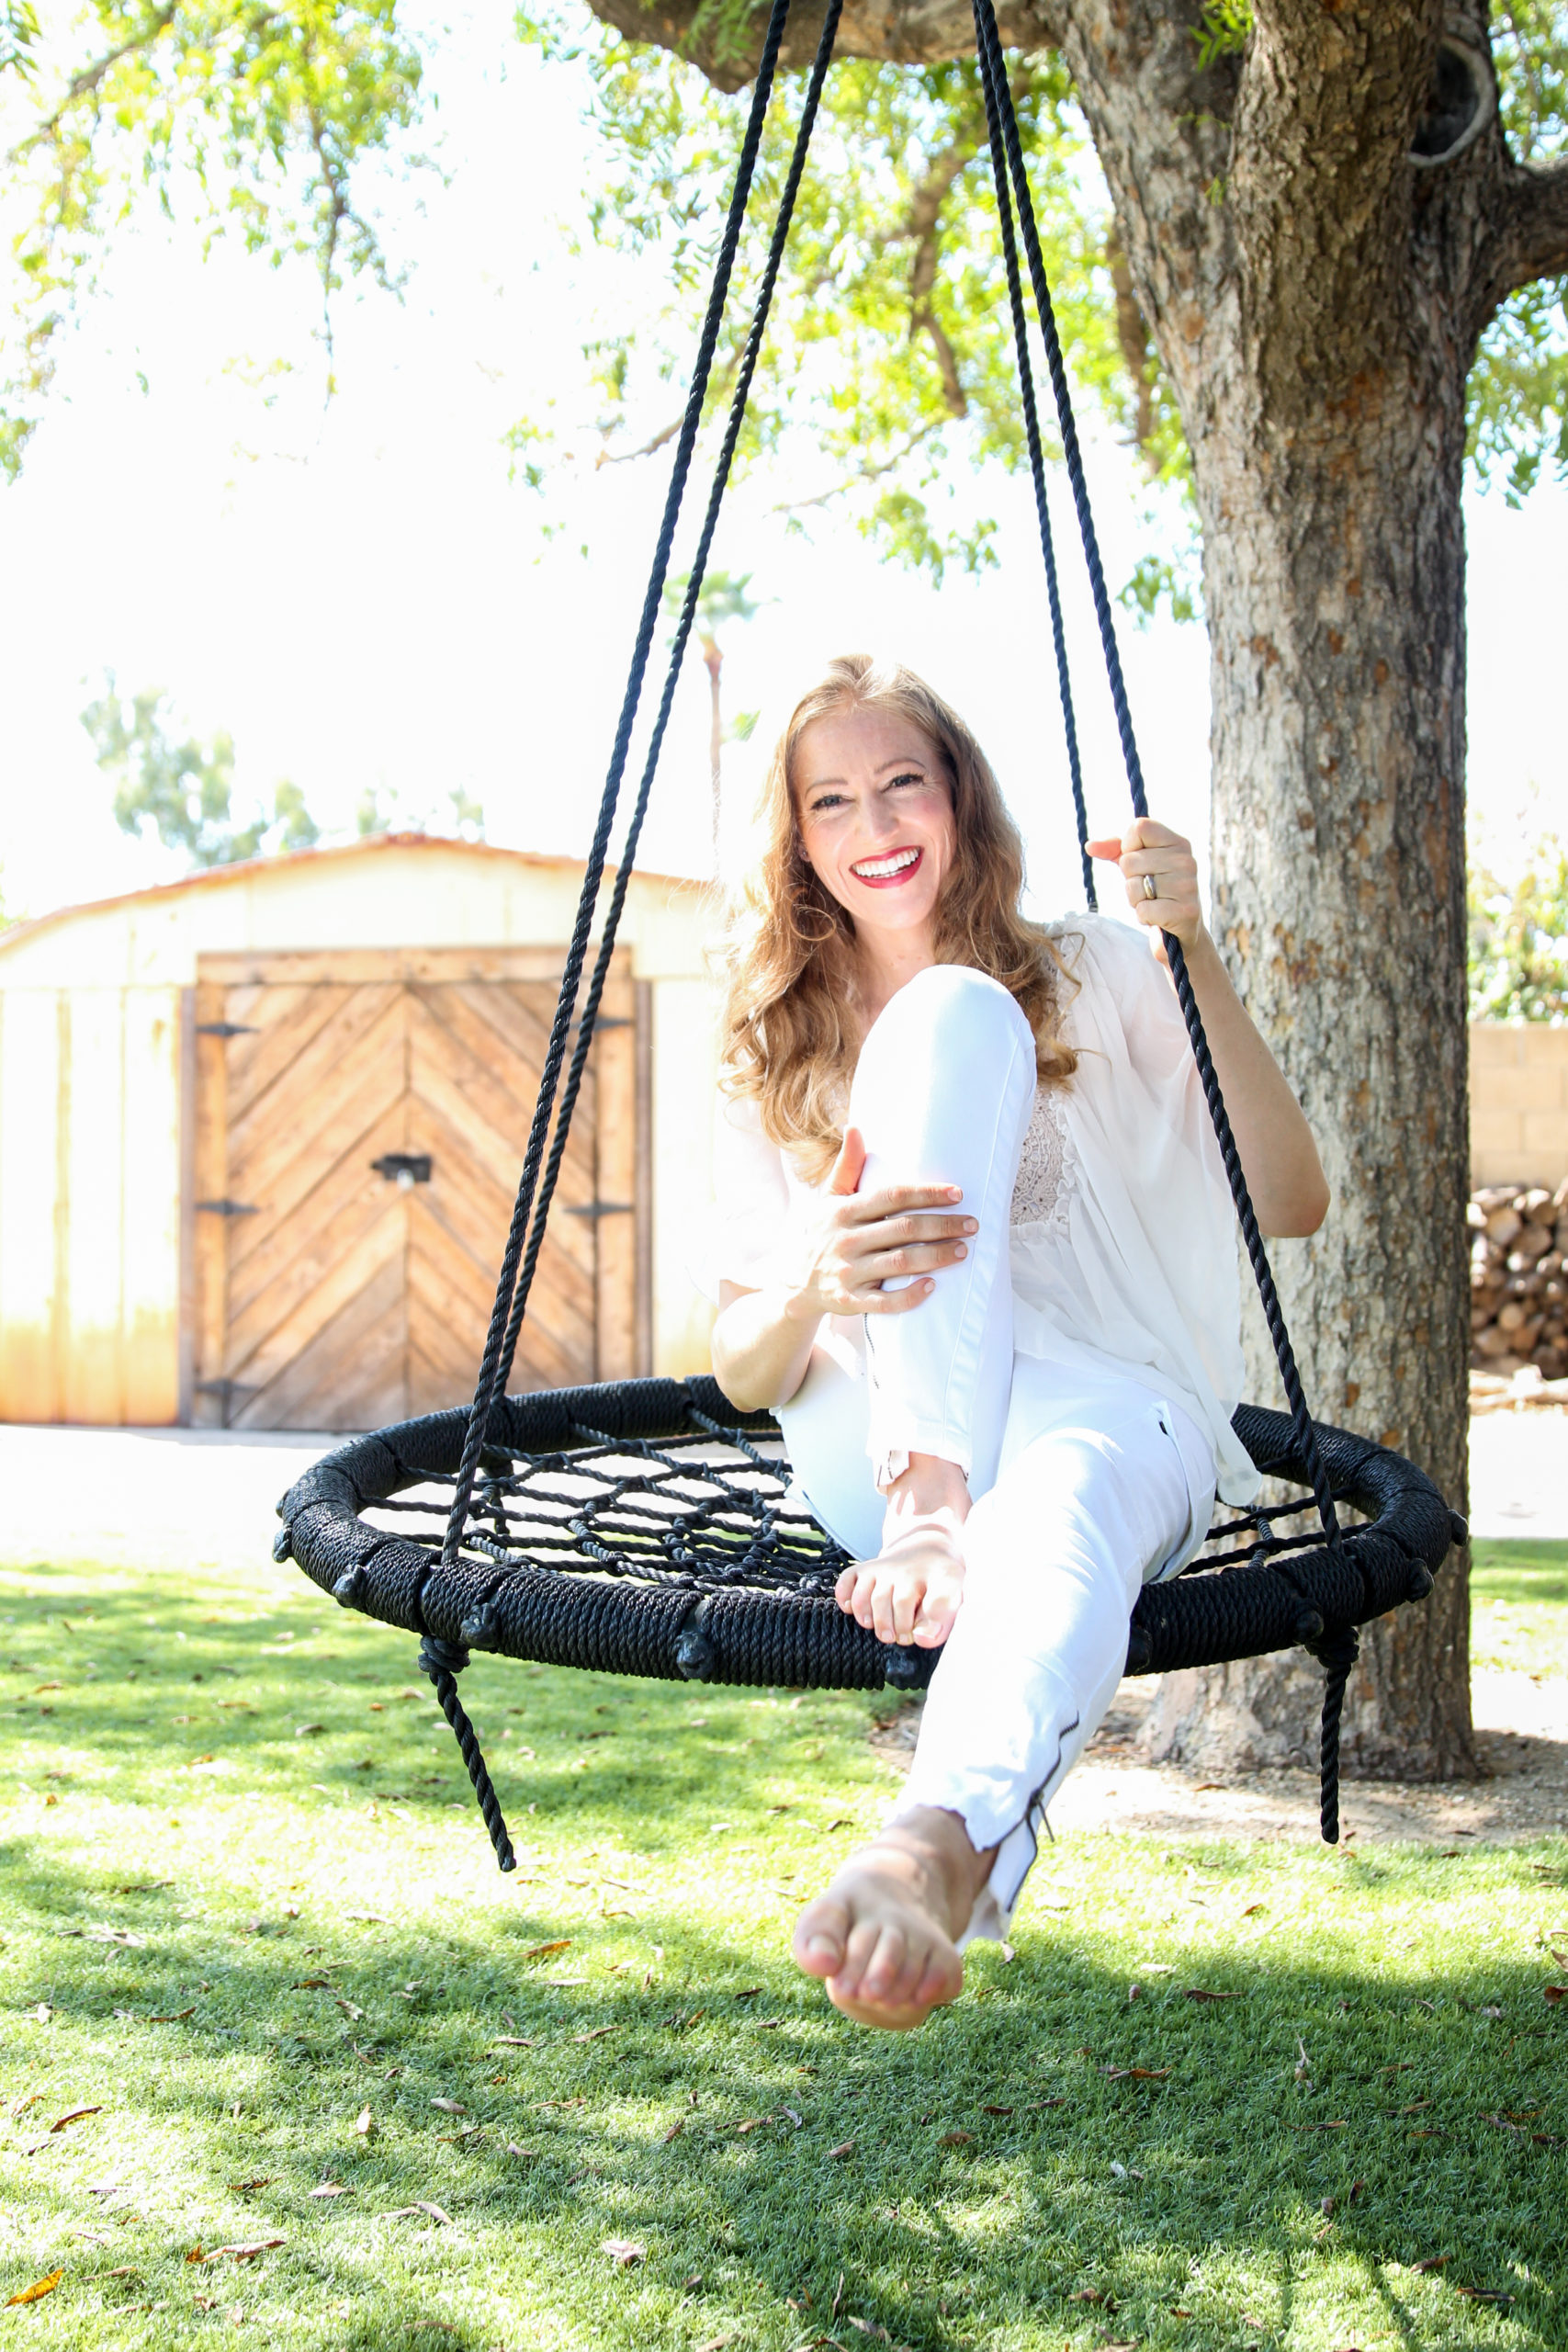 Jennifer Campbell on a swing outside under a tree